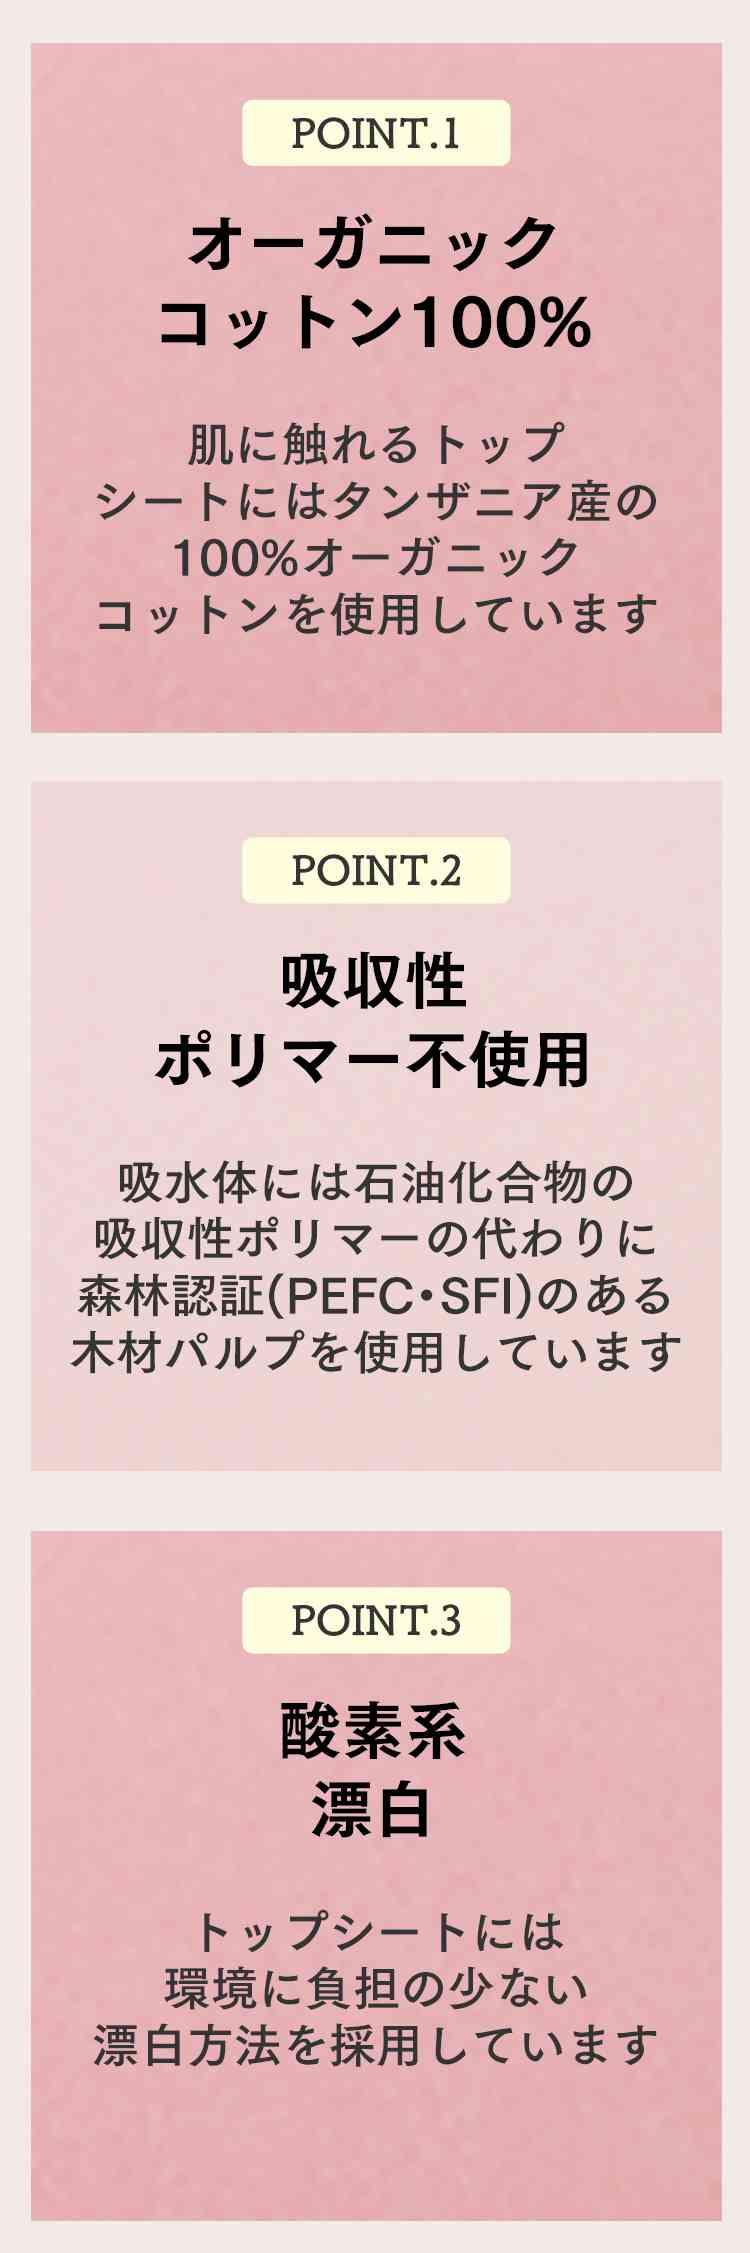 point.1 オーガニックコットン100% point.2 吸収性ポリマー不使用 point.3 酸素系漂白